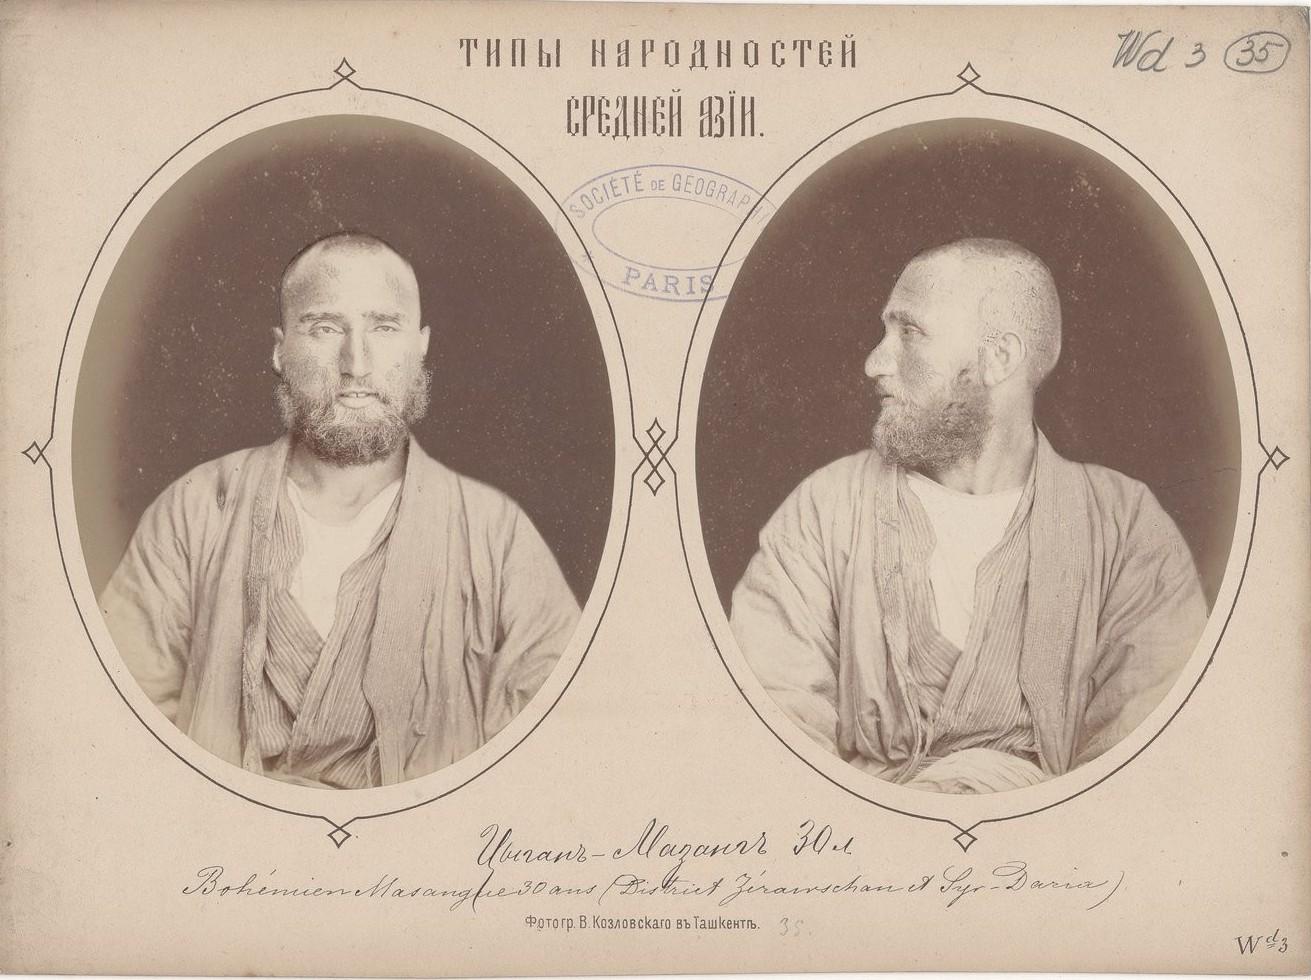 Цыган-мазанг,30 лет. Зеравшанский округ